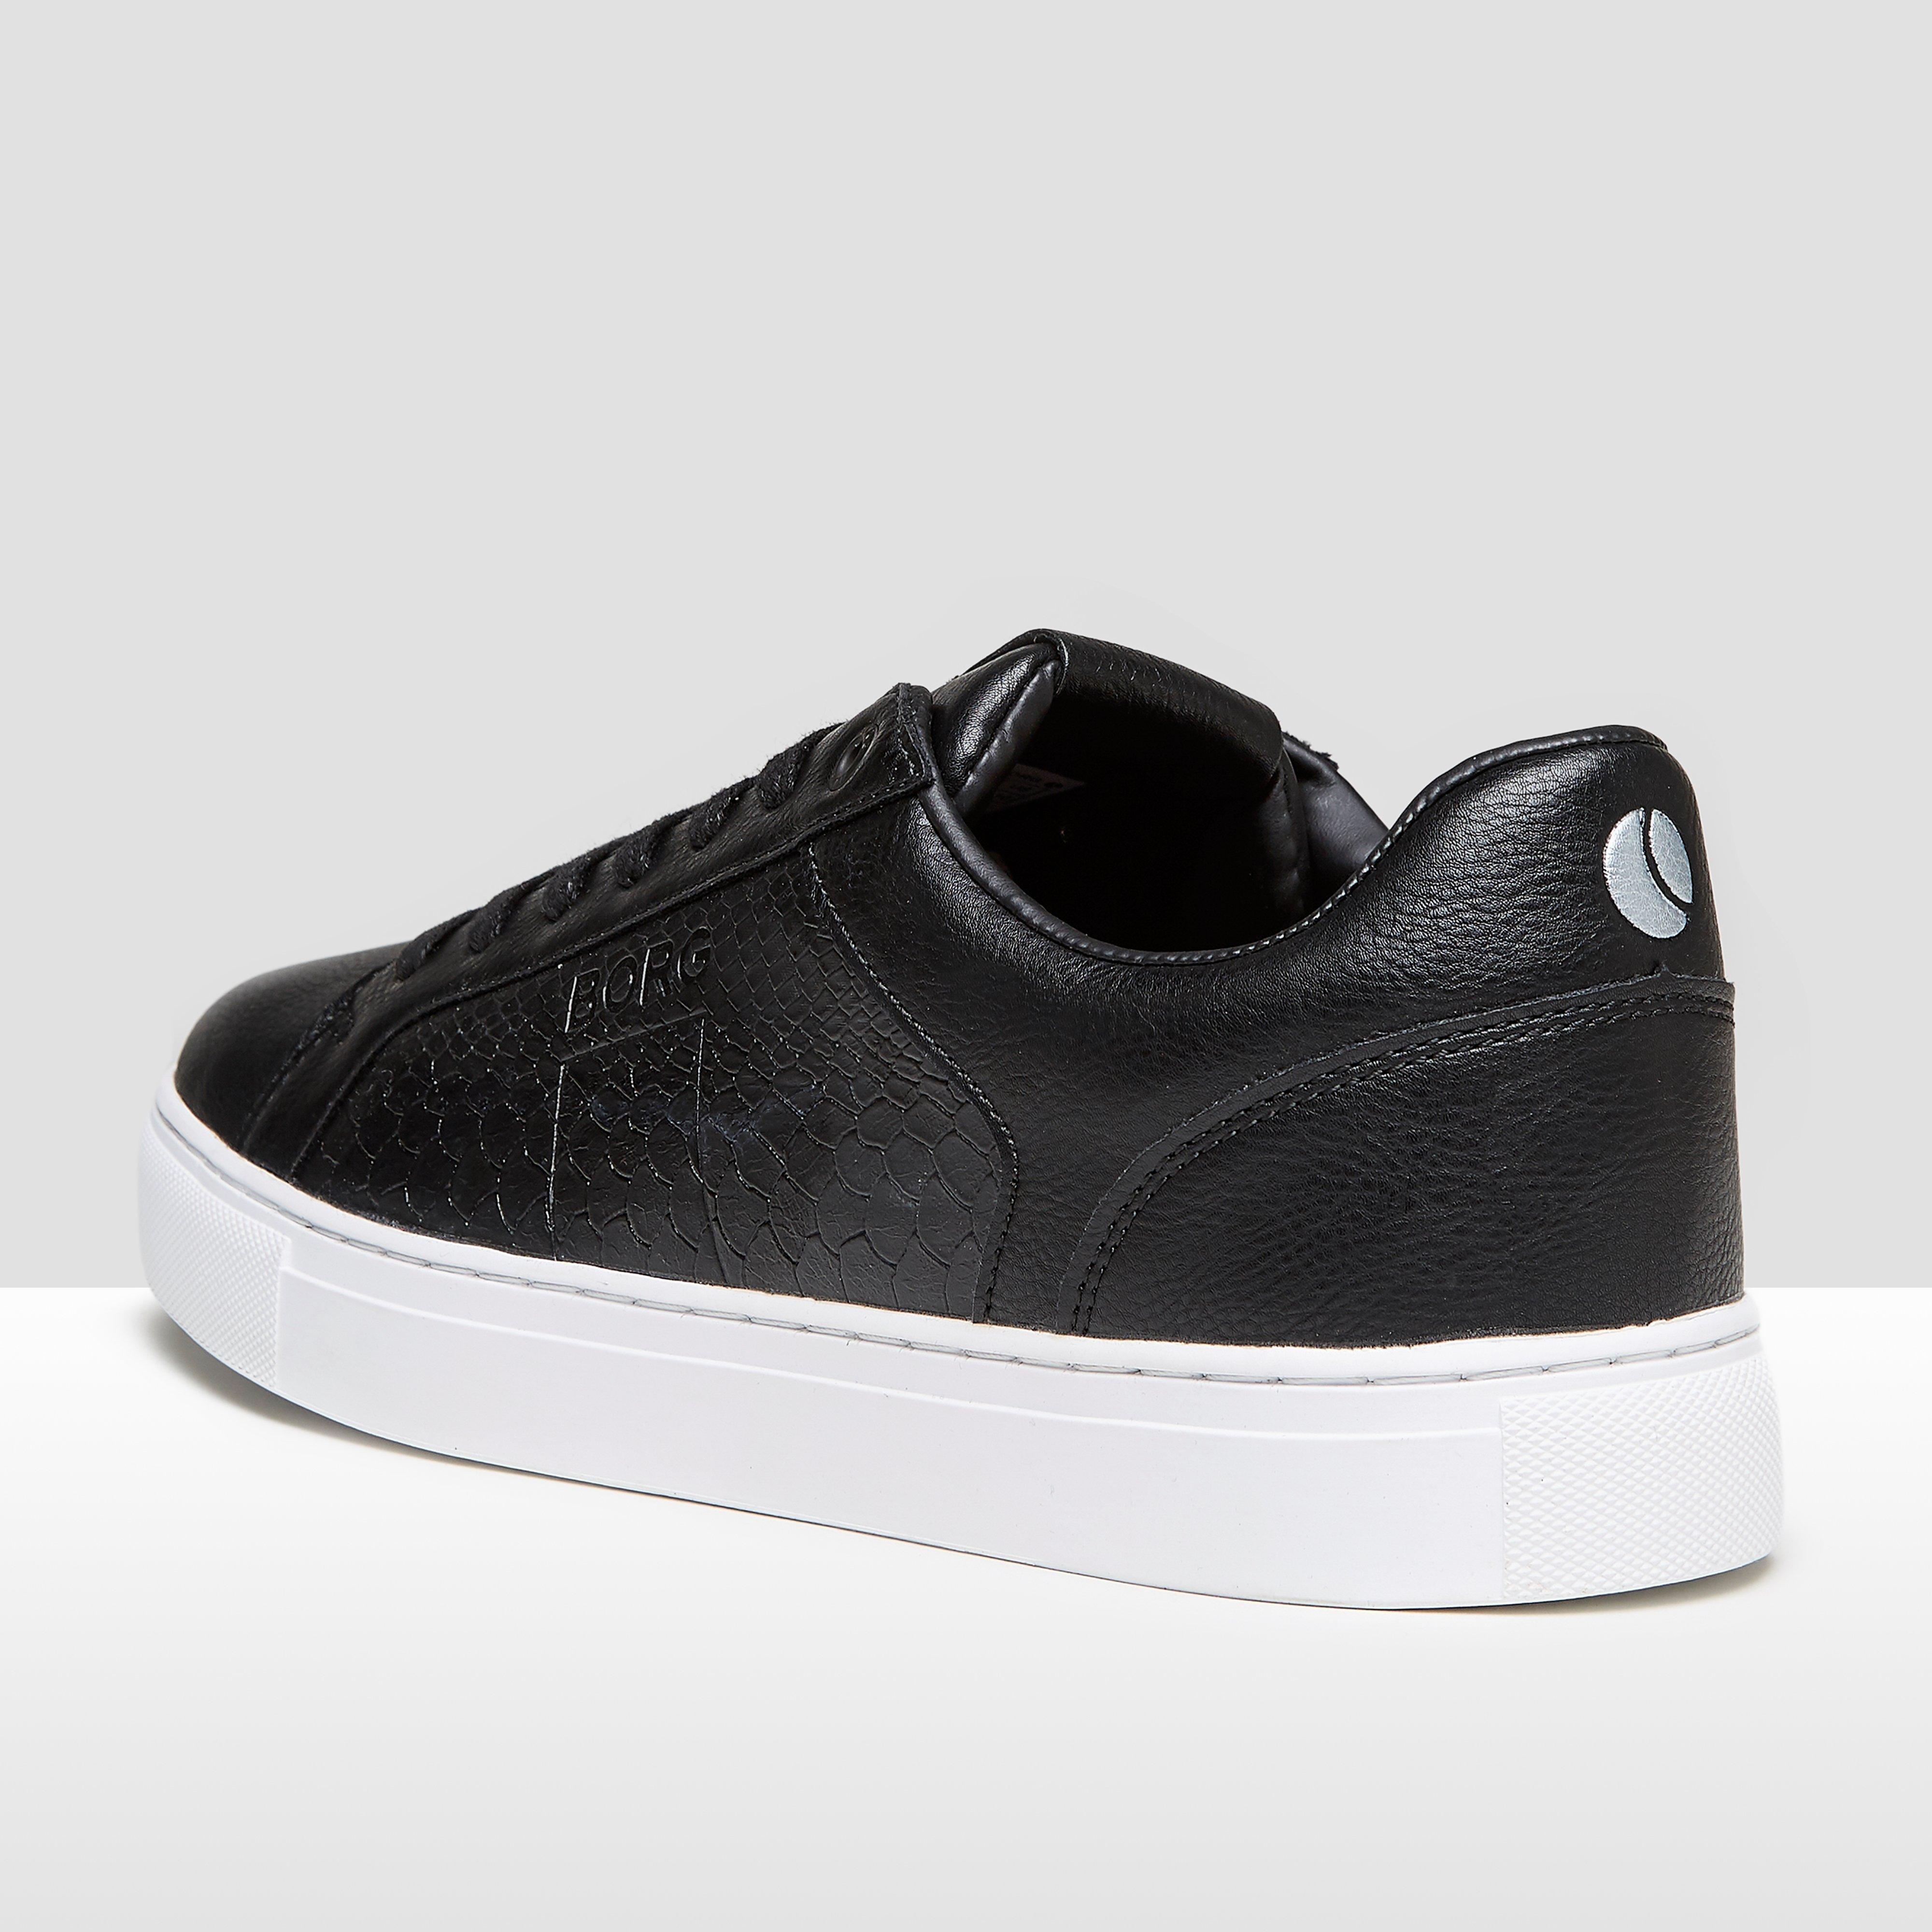 Chaussures De Sport De Dépôt Bjoern Noir k1UuJXnWIL